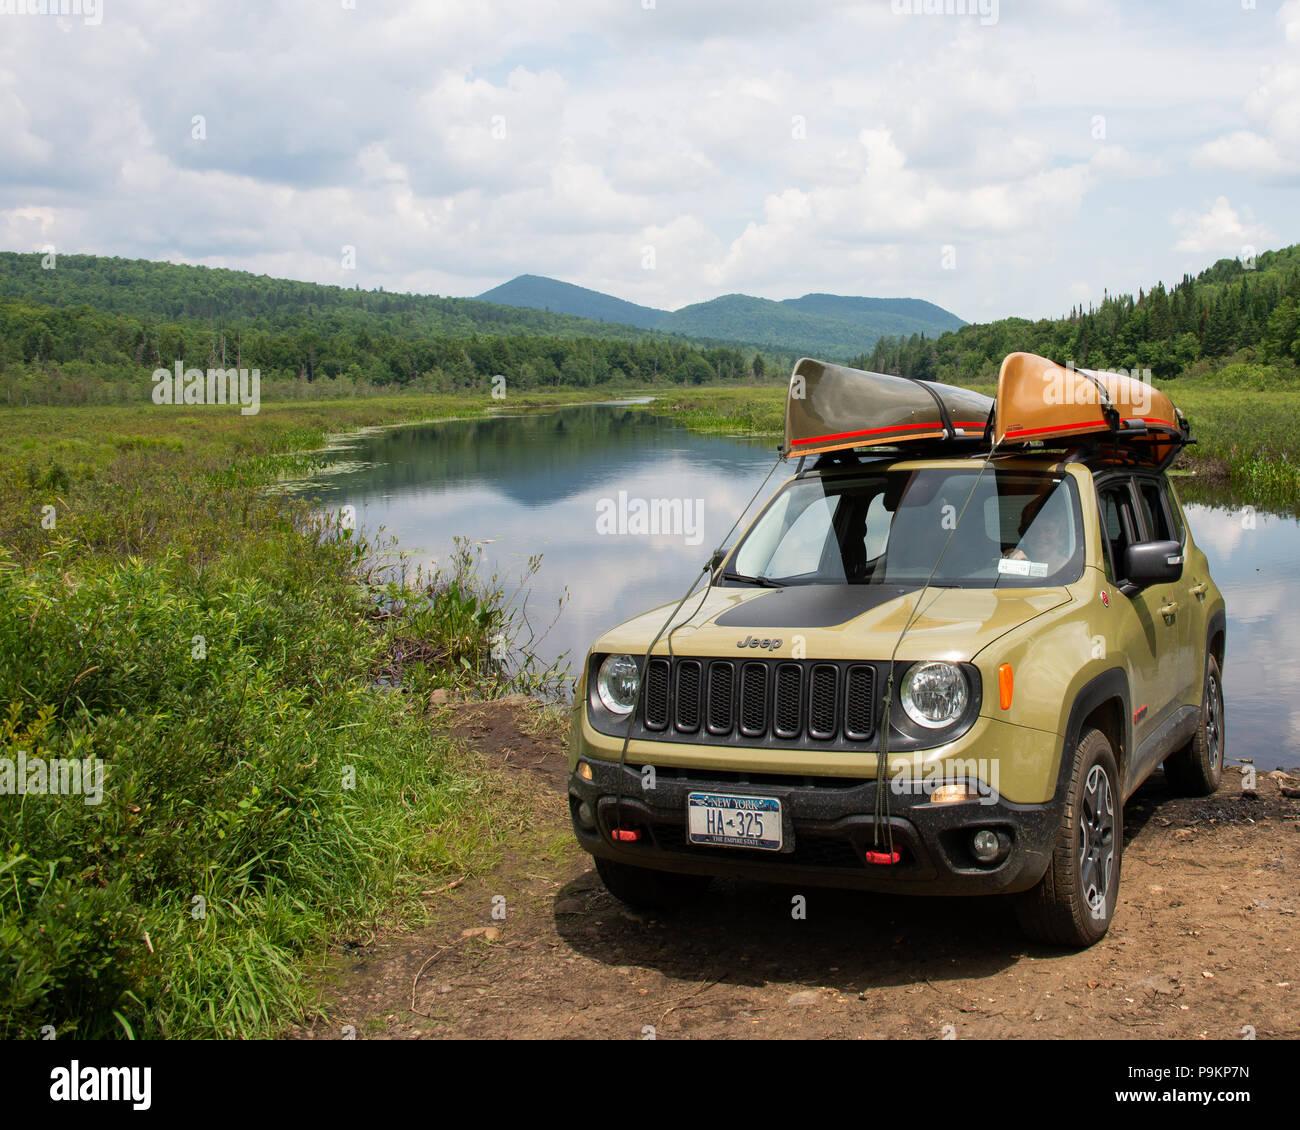 Kevlar Canoe Stock Photos & Kevlar Canoe Stock Images - Alamy